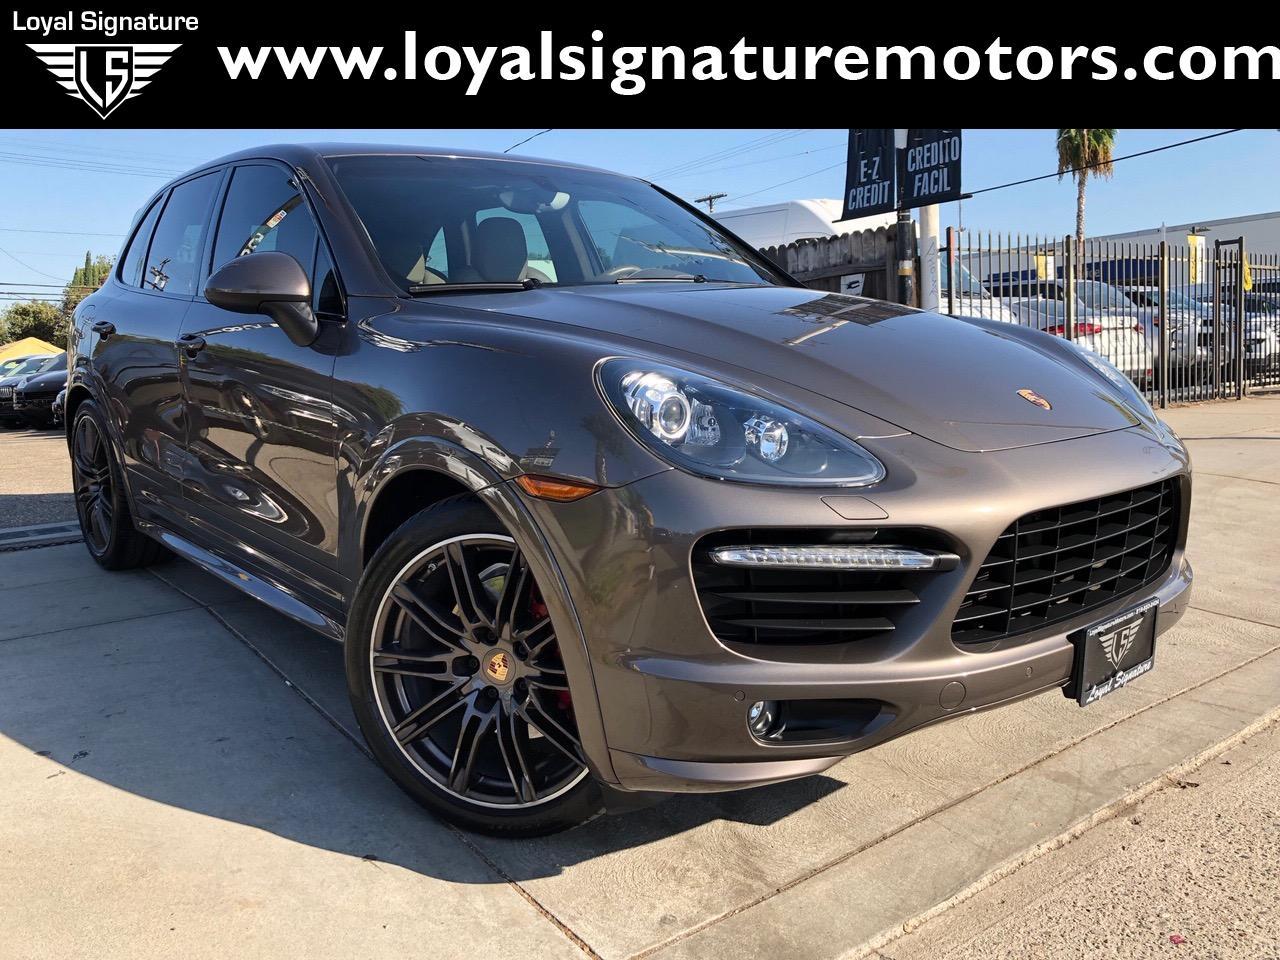 Used 2013 Porsche Cayenne Gts For Sale 34 495 Loyal Signature Motors Inc Stock 2019299